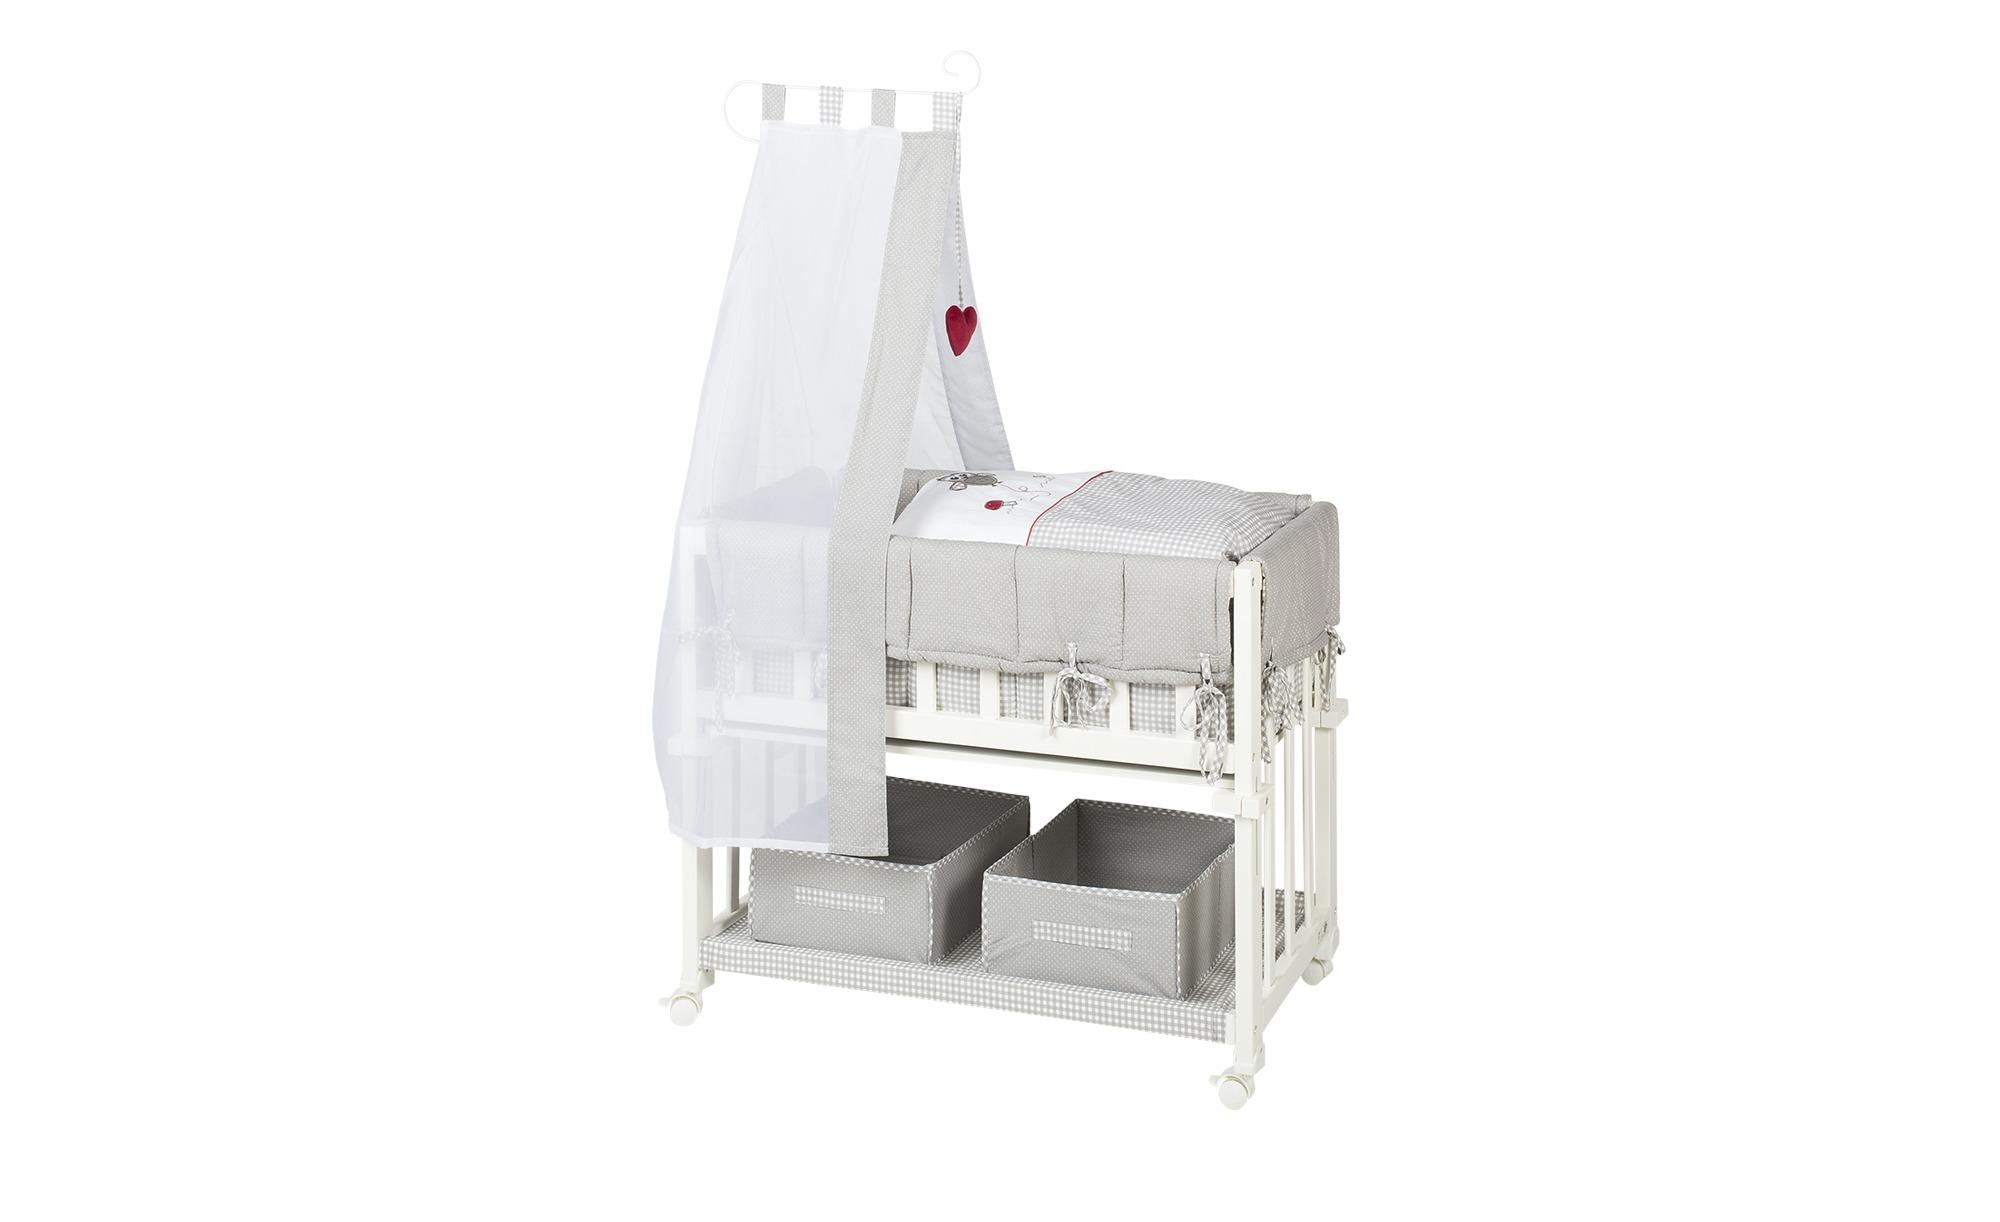 Roba komplettstubenbett 40x80 weiß & grau adam & eule adam & eule